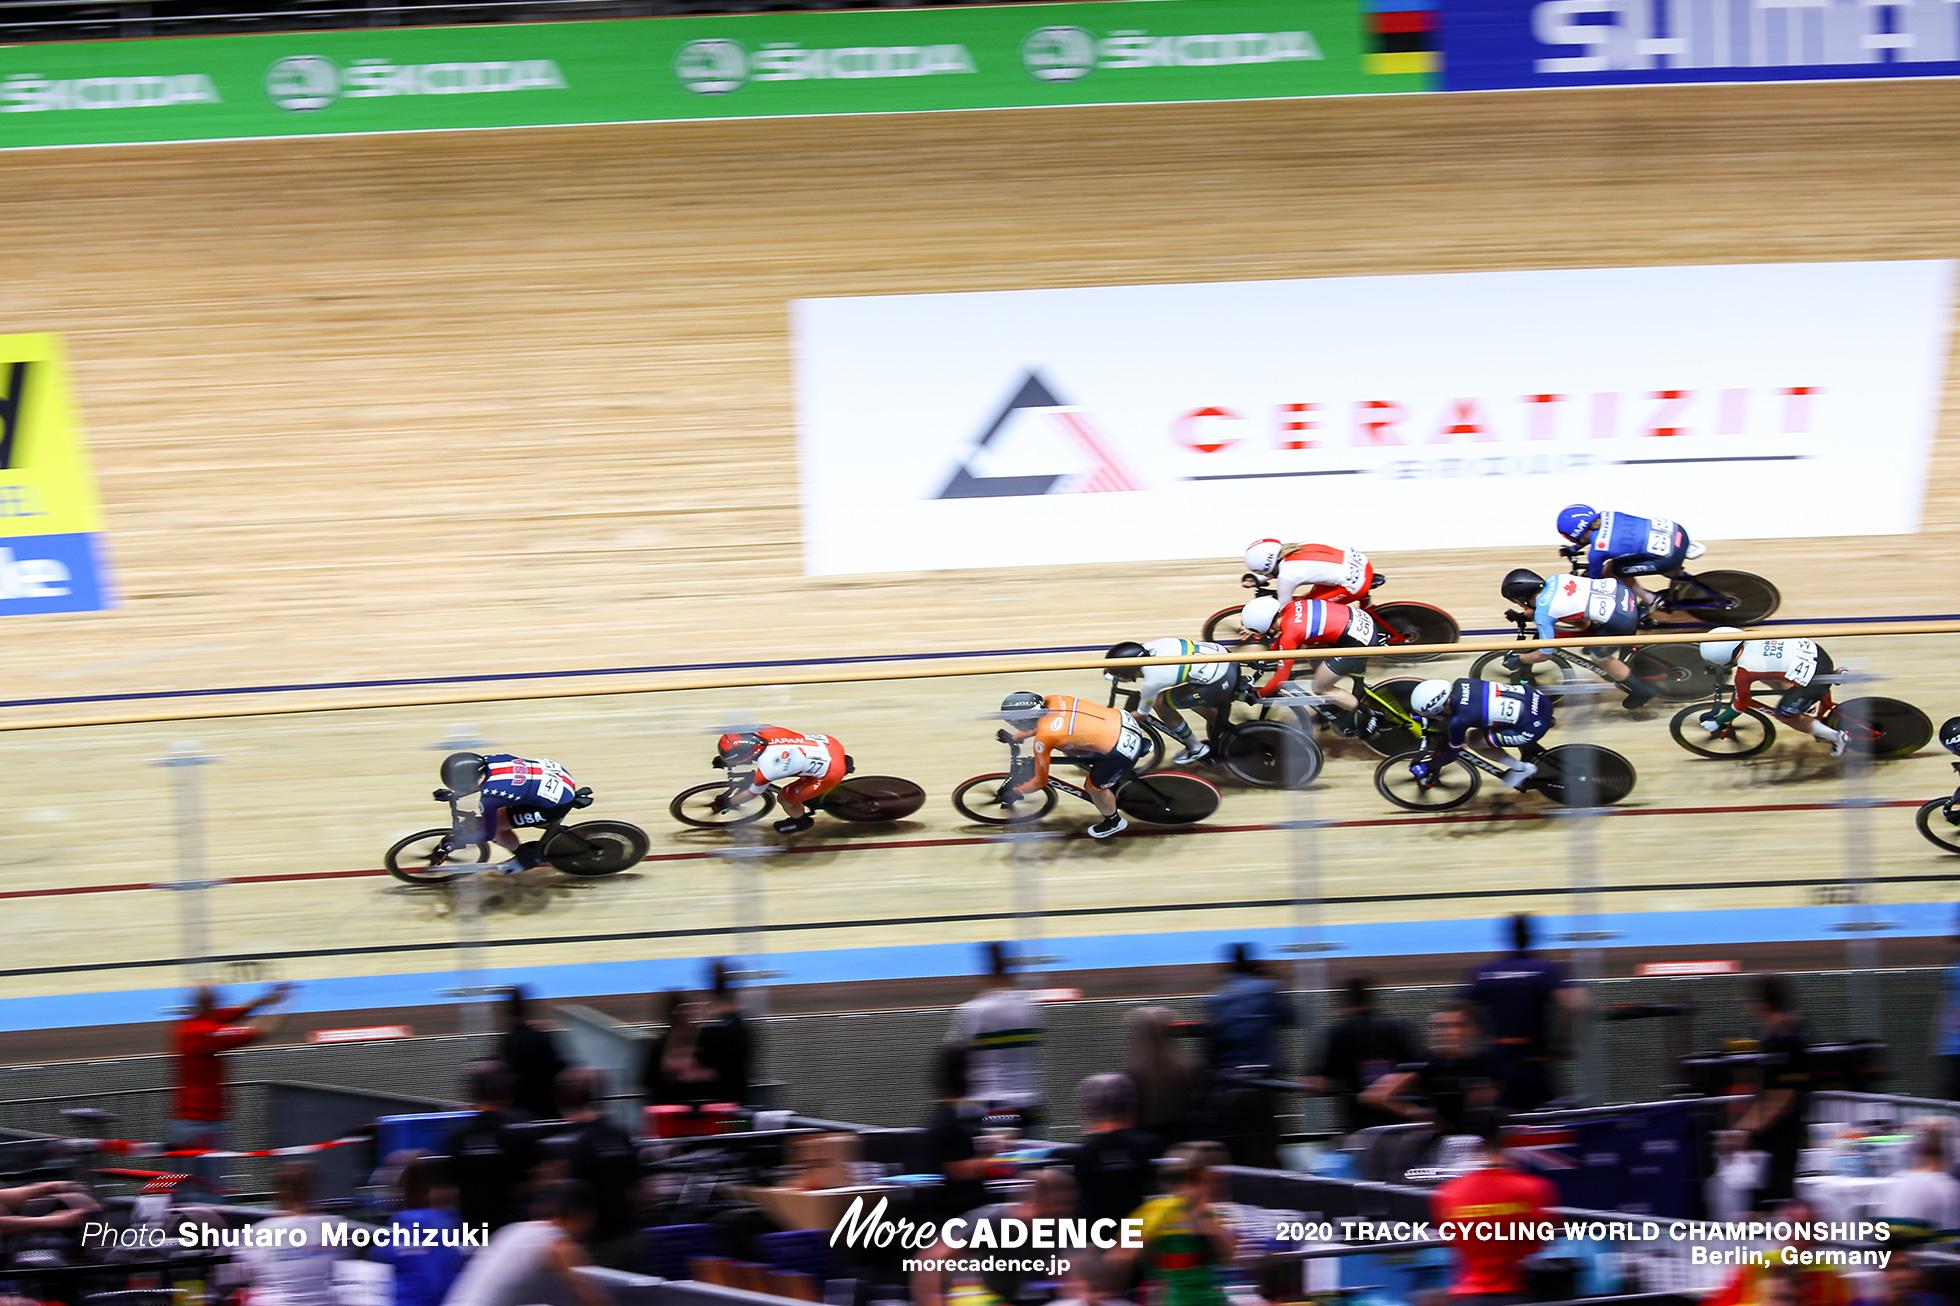 Scratch Race / Women's Omnium / 2020 Track Cycling World Championships